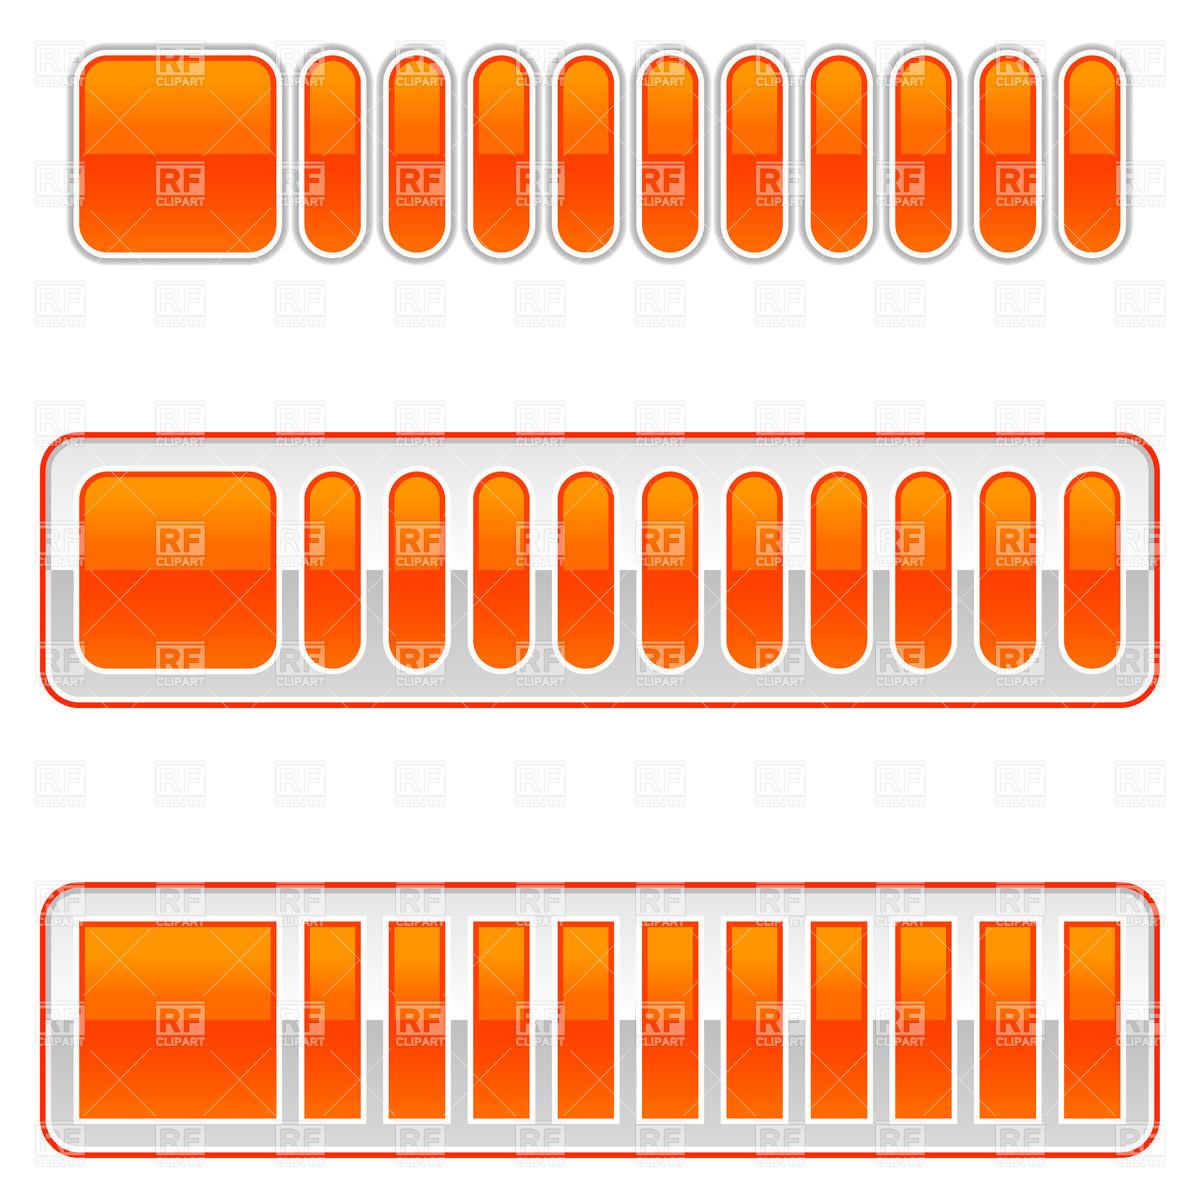 1200x1200 Blank Orange Loading Bar Vector Image Vector Artwork Of Design